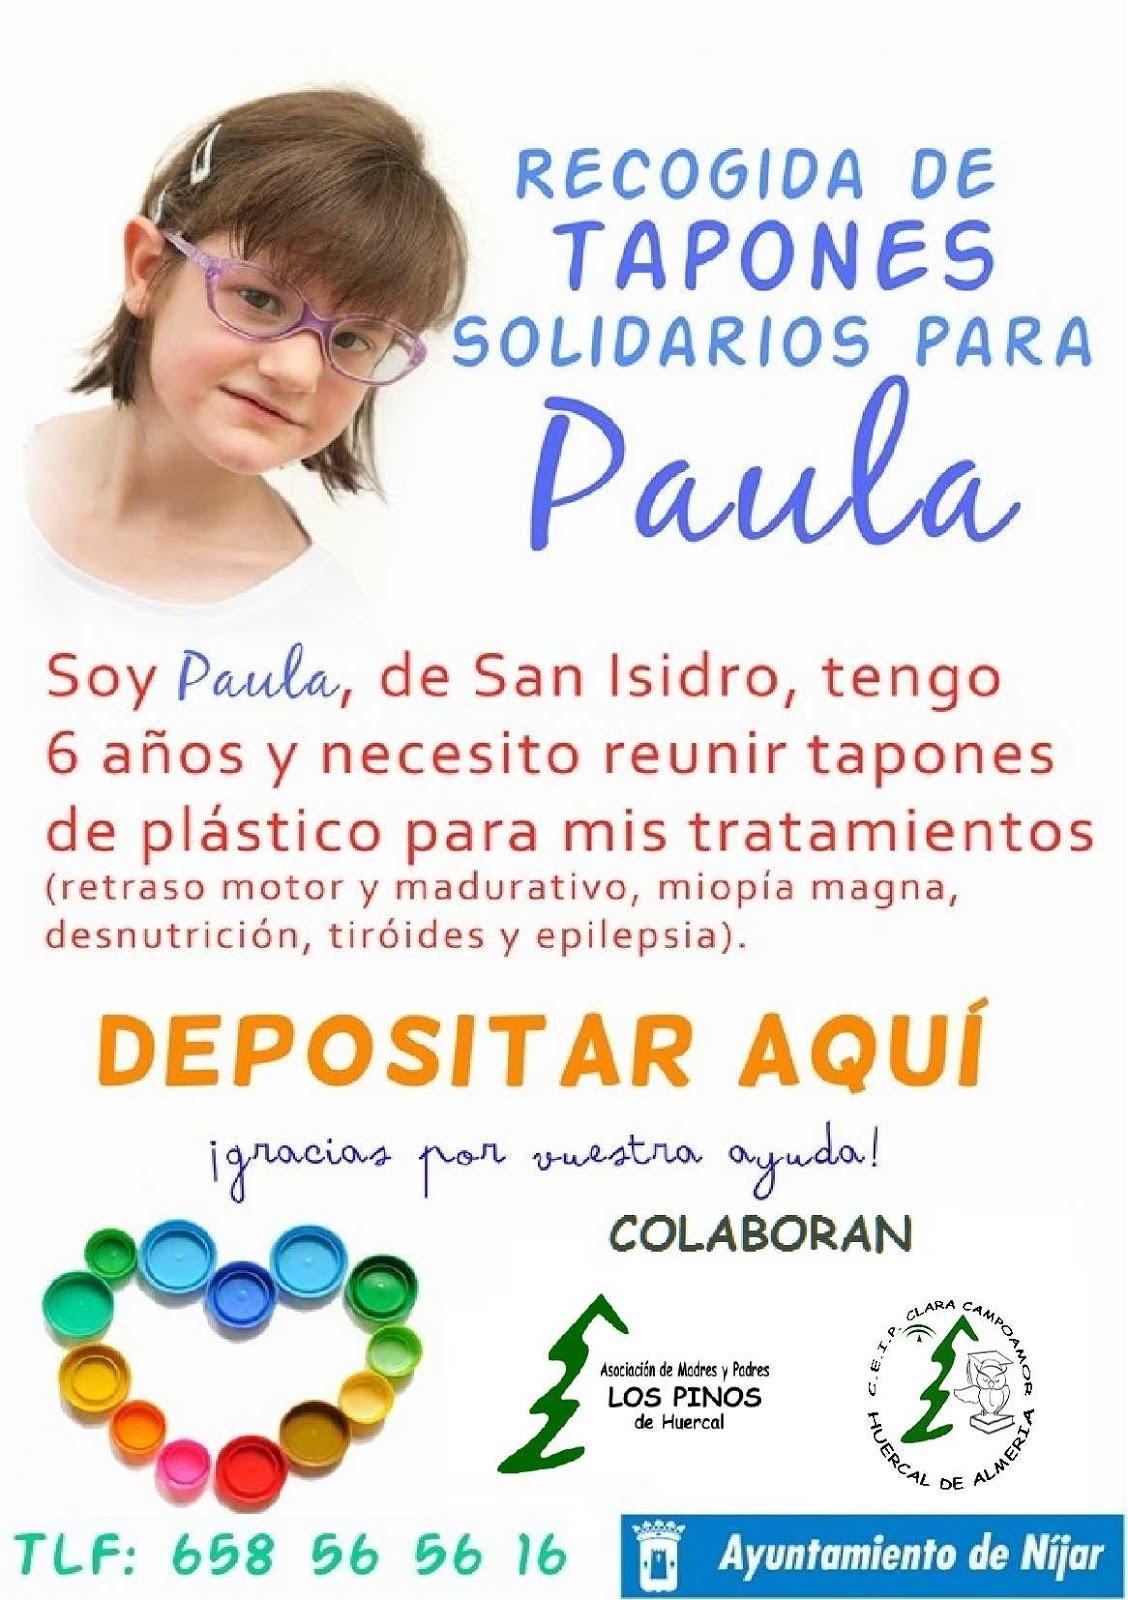 Tapones para Paula